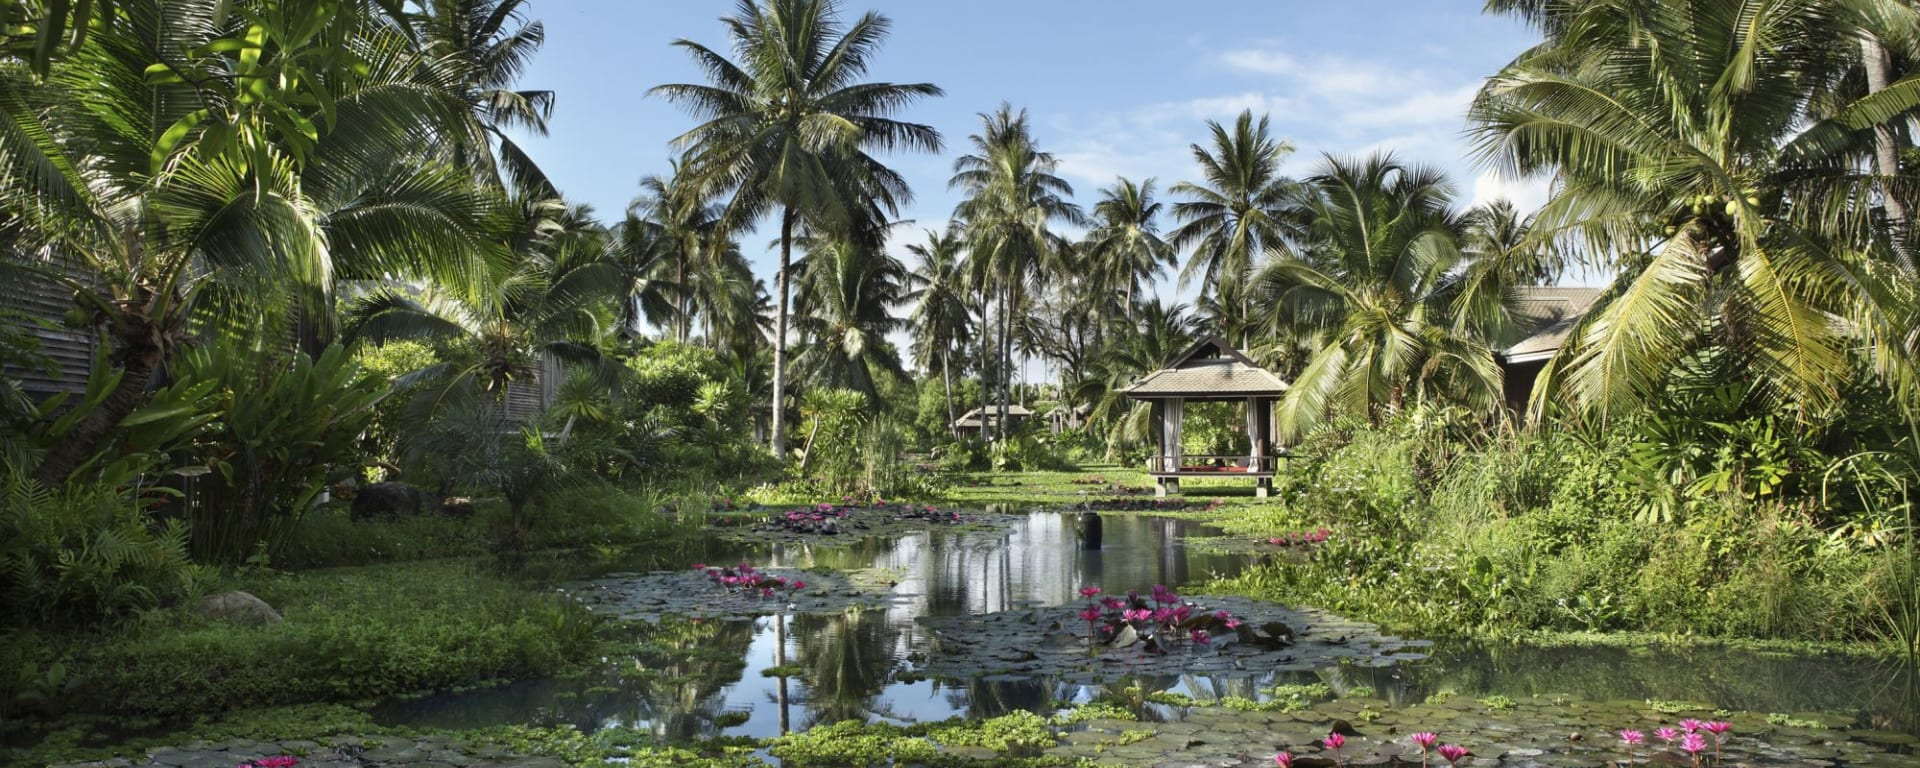 Anantara Mai Khao Phuket Villas: Lagoon